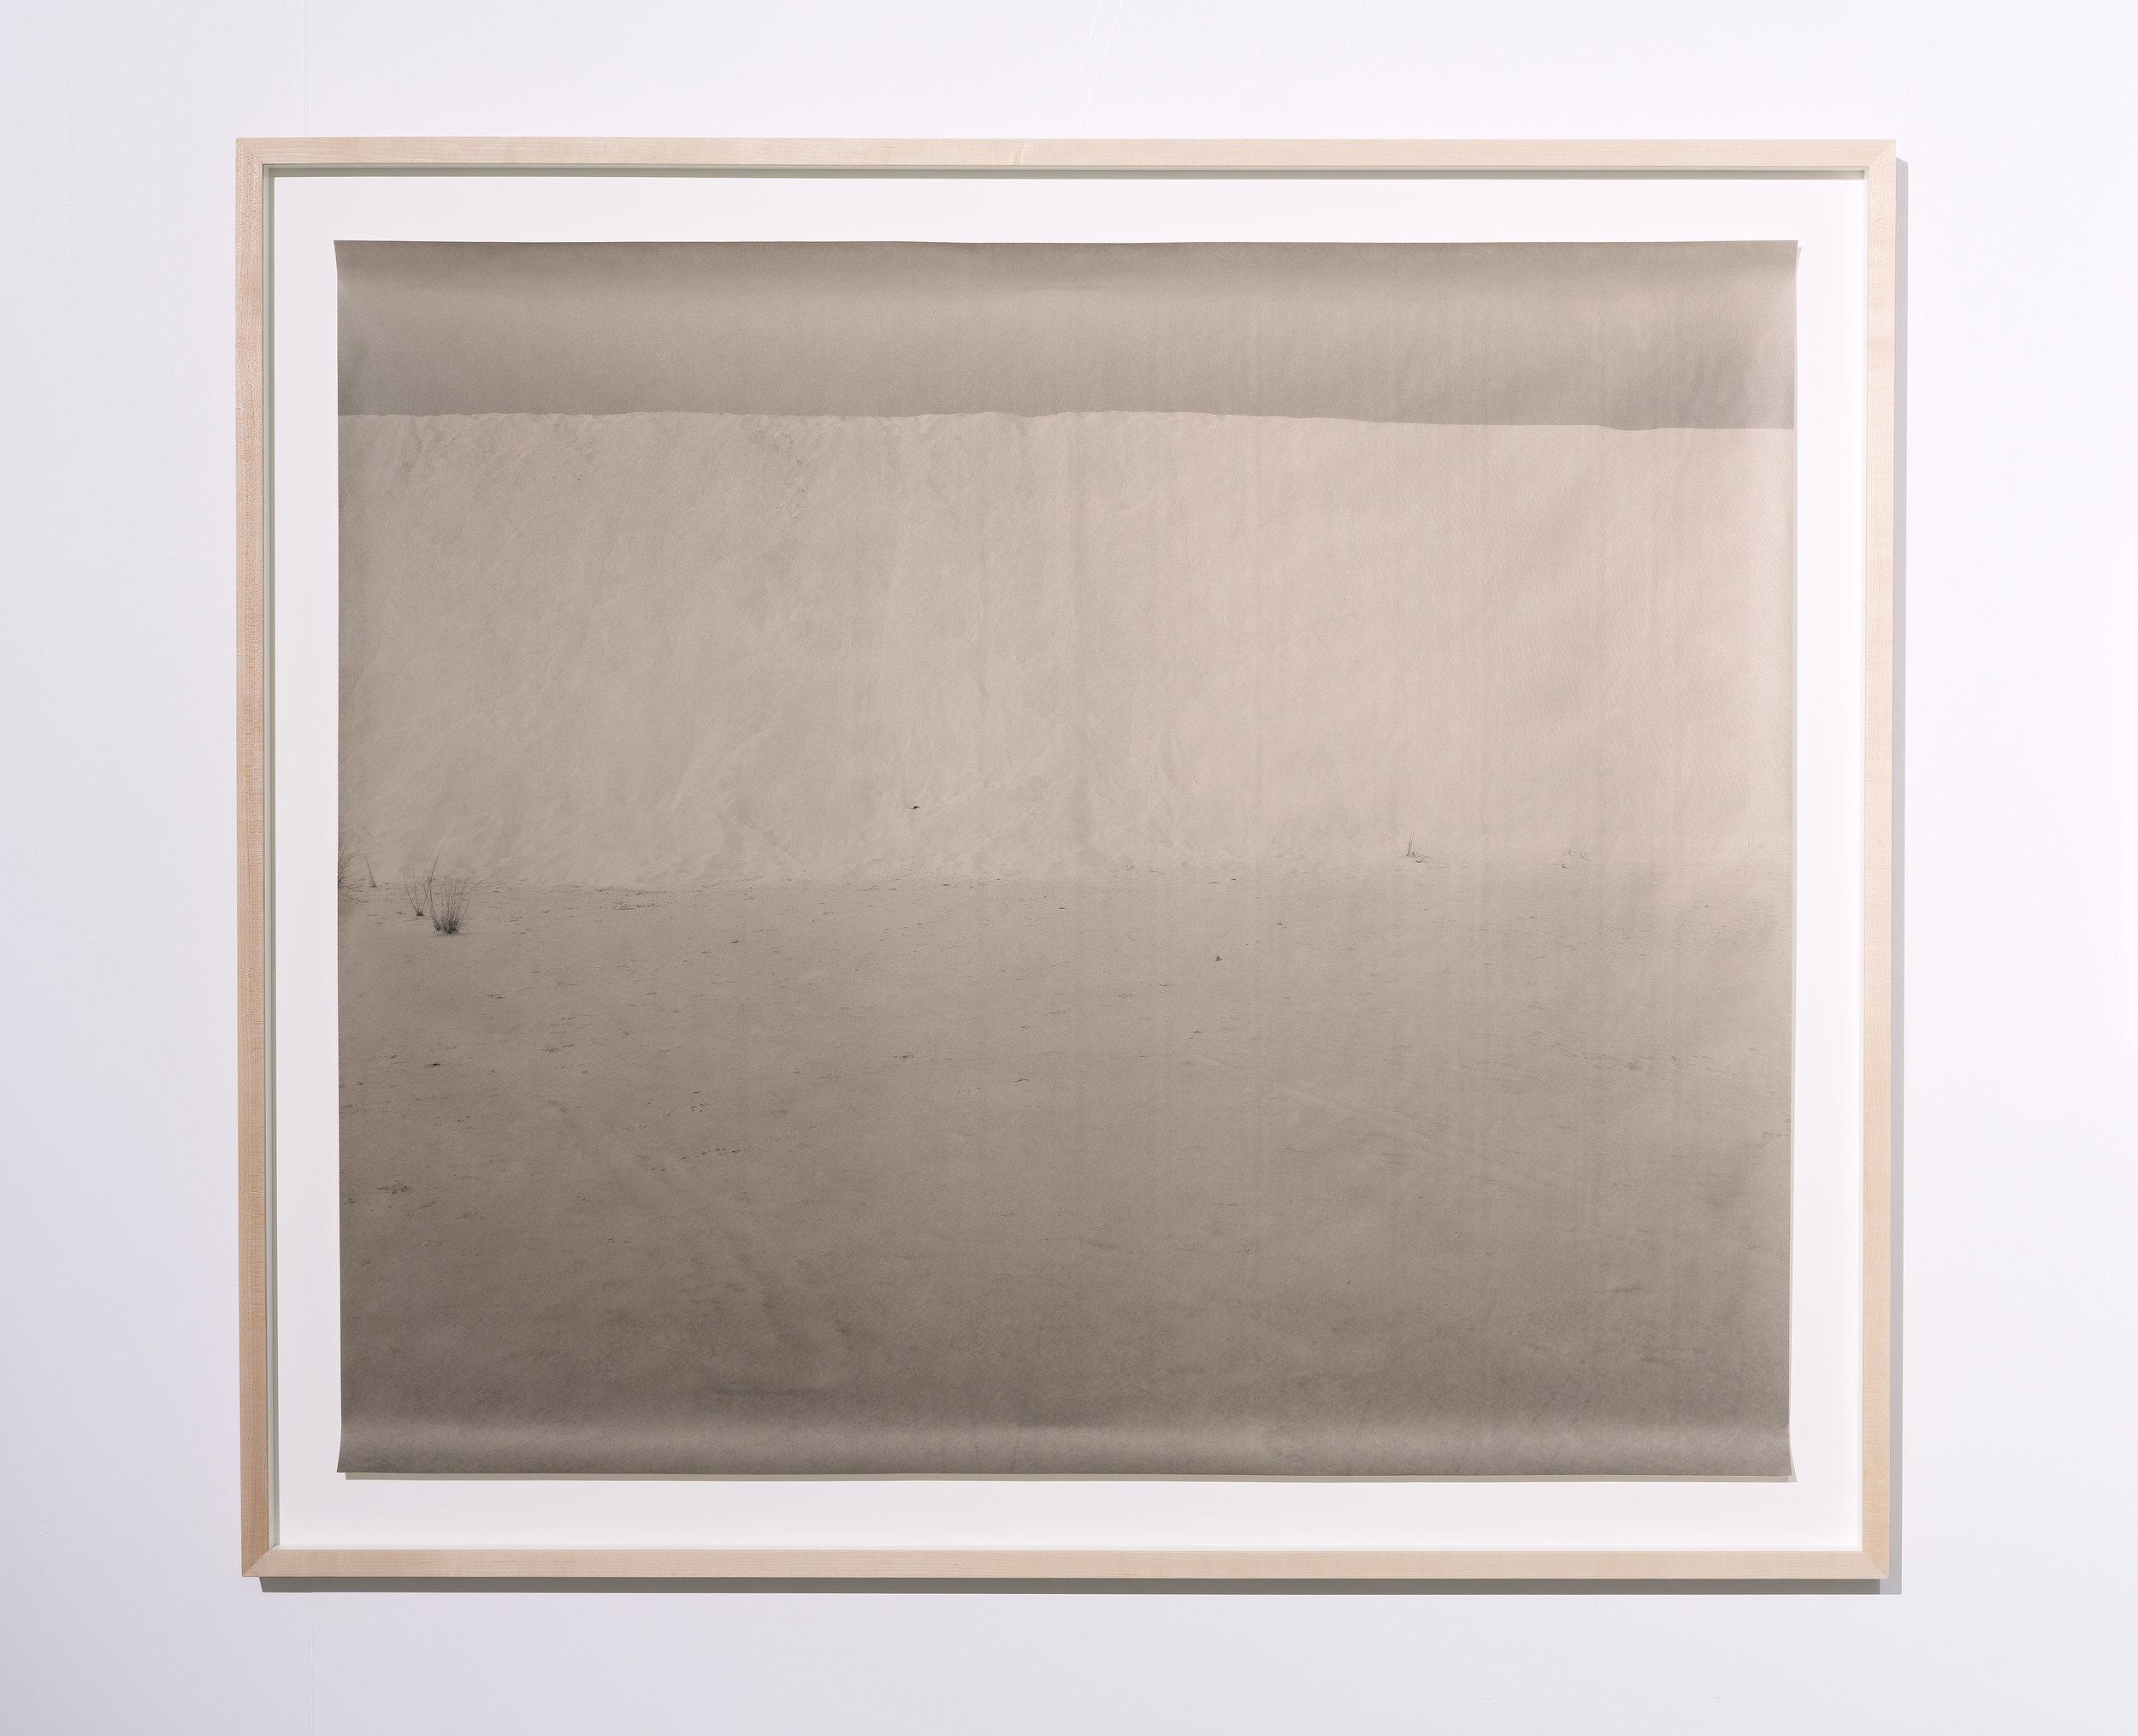 mur1-01.jpg